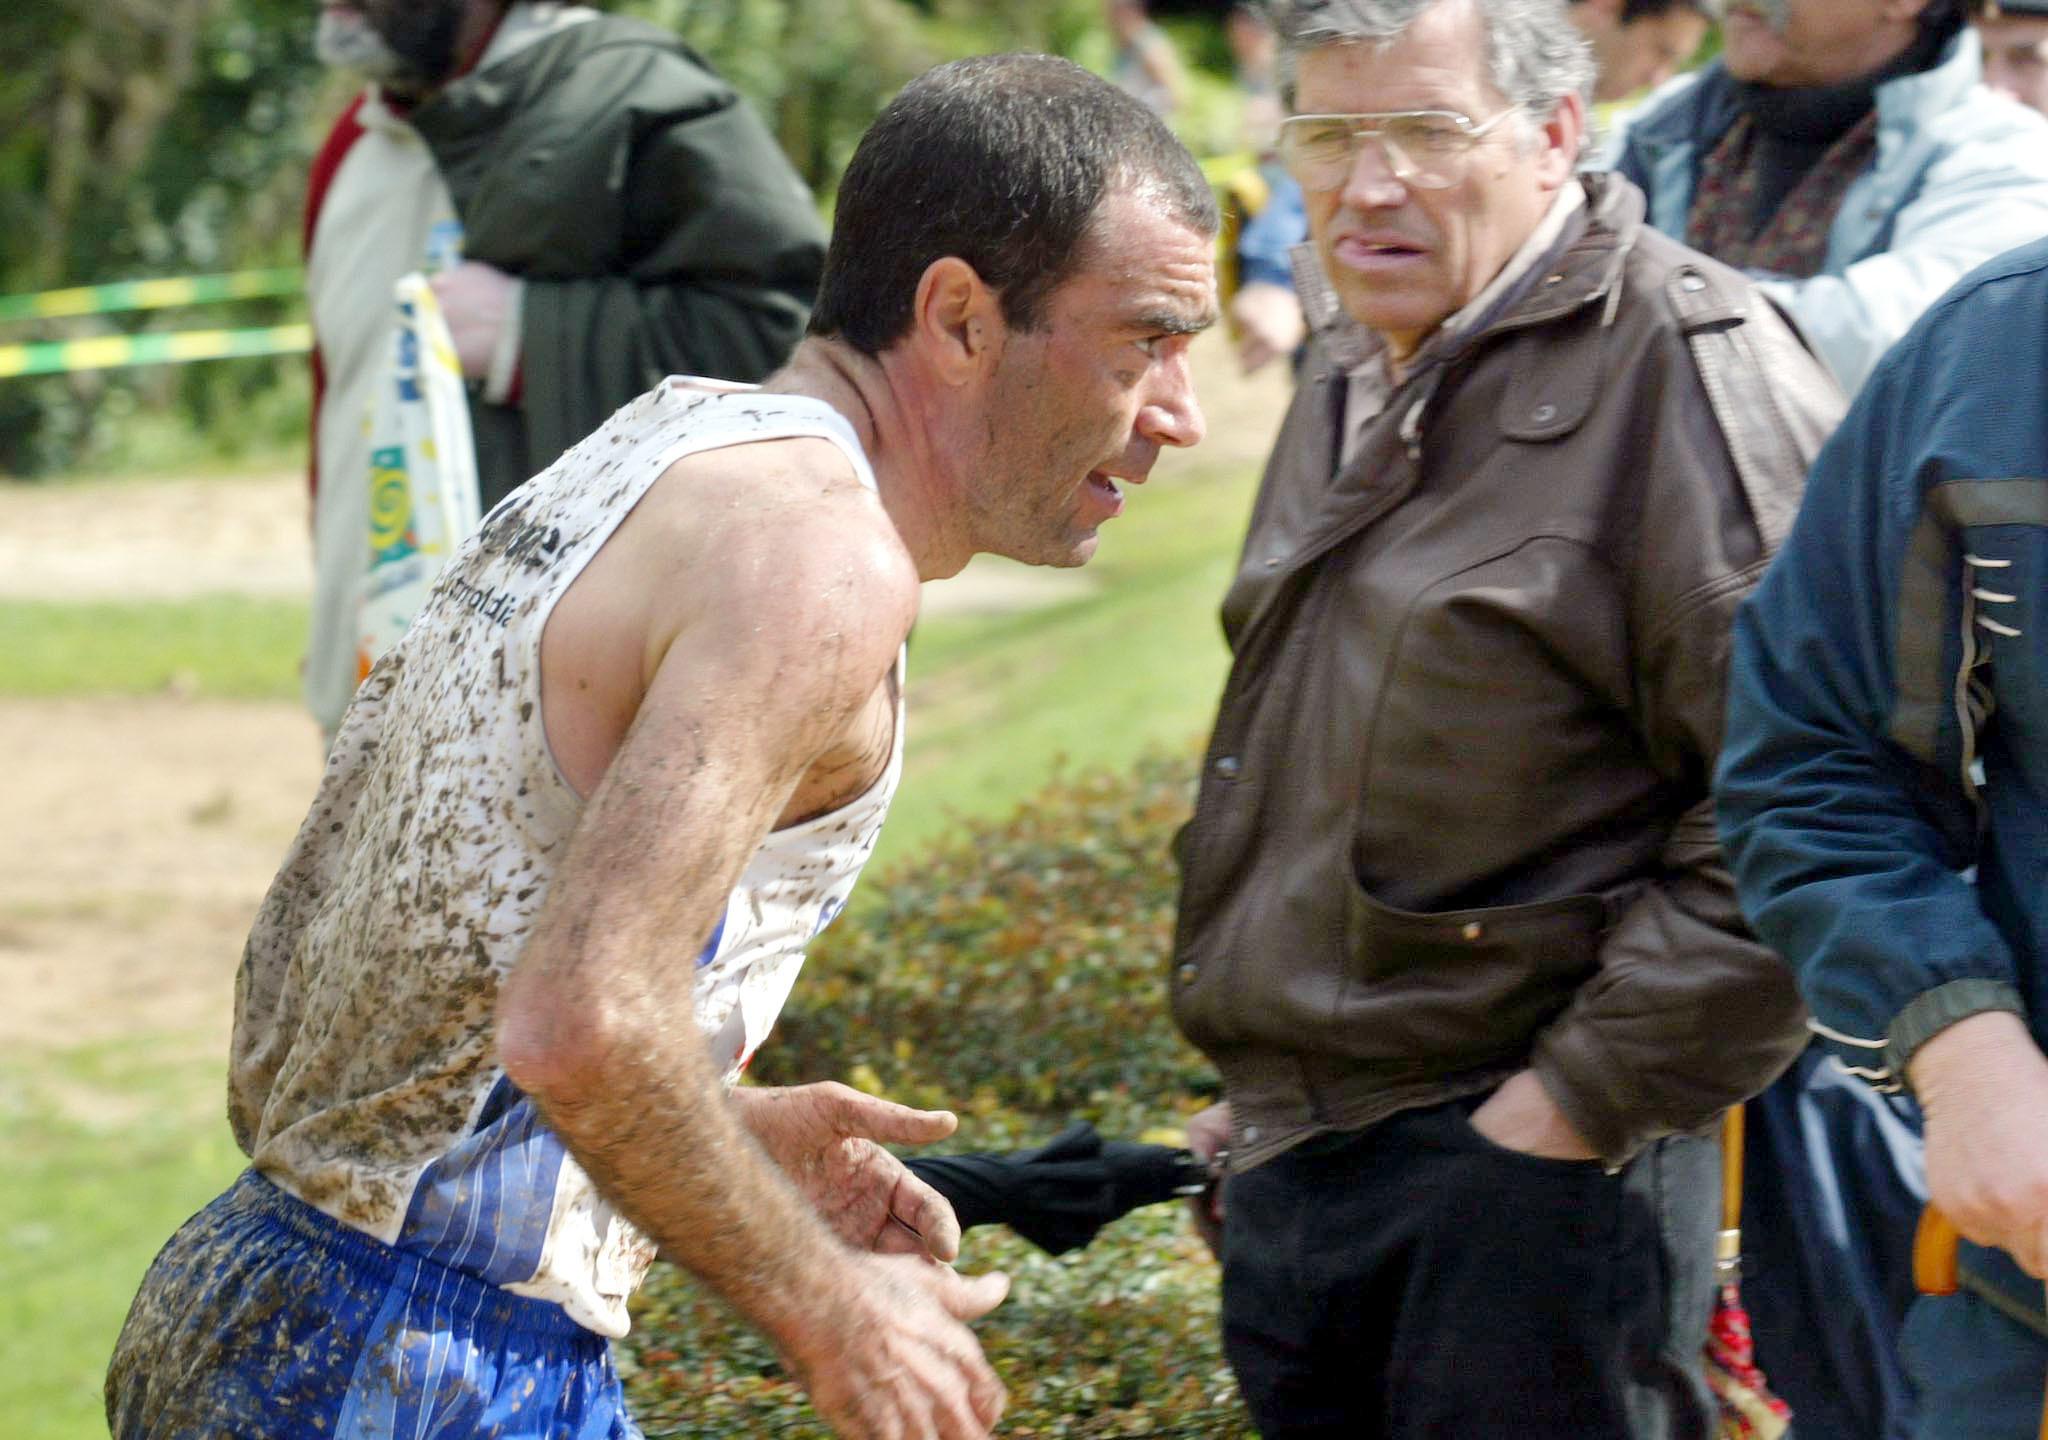 Domingos Castro completou Maratona de Sevilha